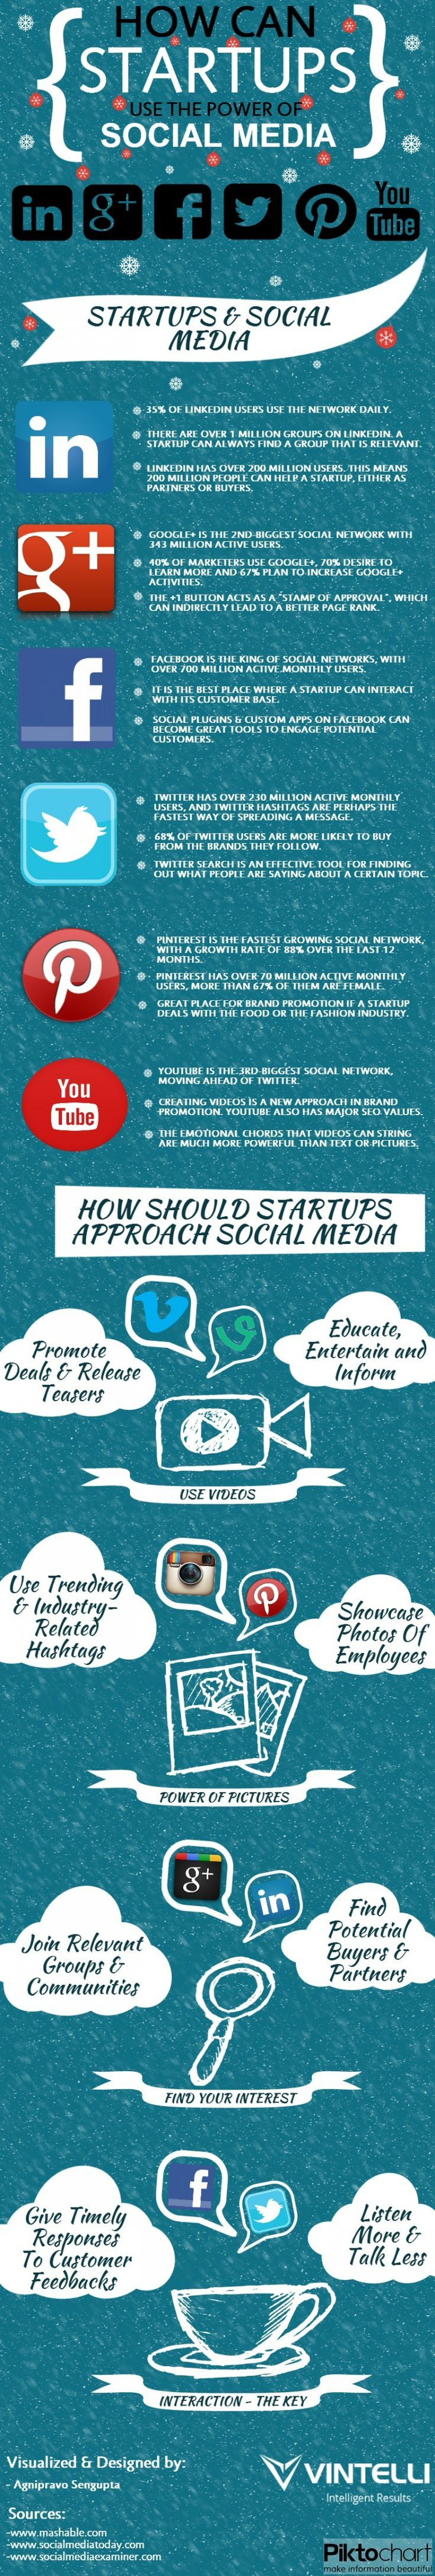 How Start-ups Can Utilize Social Media